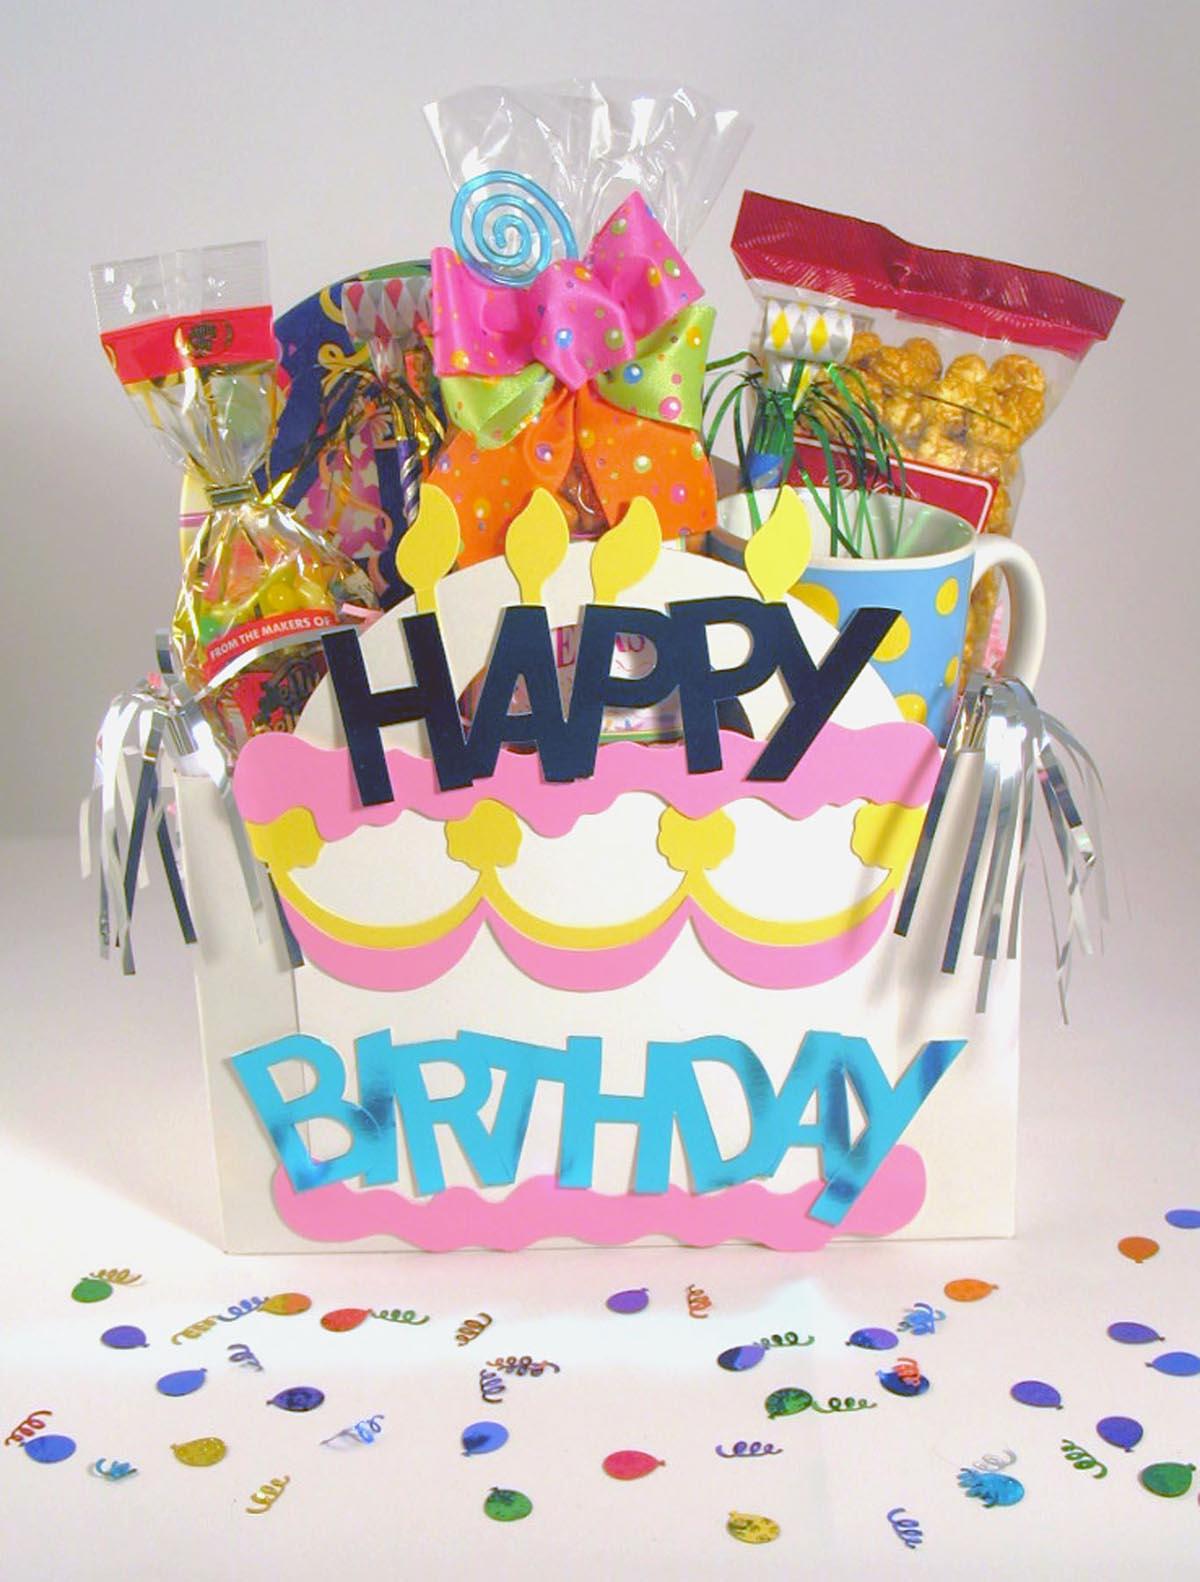 http://4.bp.blogspot.com/-ngxmBCBngDM/TVkWNL1HjQI/AAAAAAAAAOA/RNwPJDz-Bfc/s1600/BirthdayWishes-PinknBlue.jpg